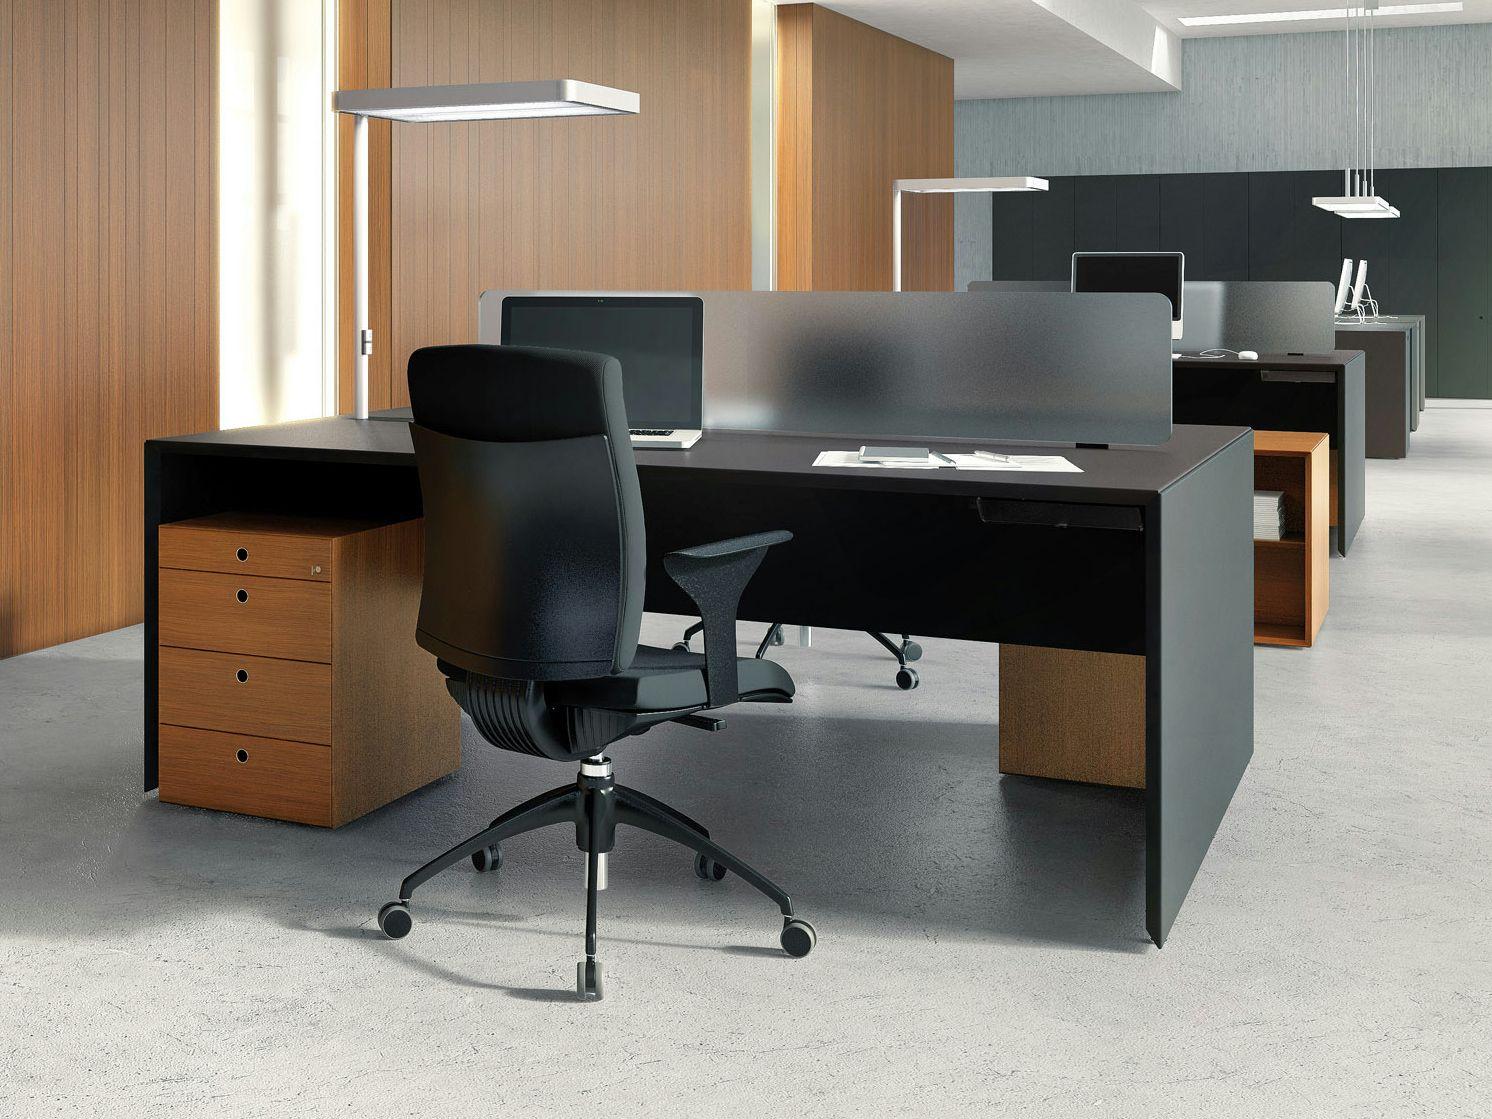 Rectangular Workstation Desk 120 Cm Quaranta5 Collection By Fantoni